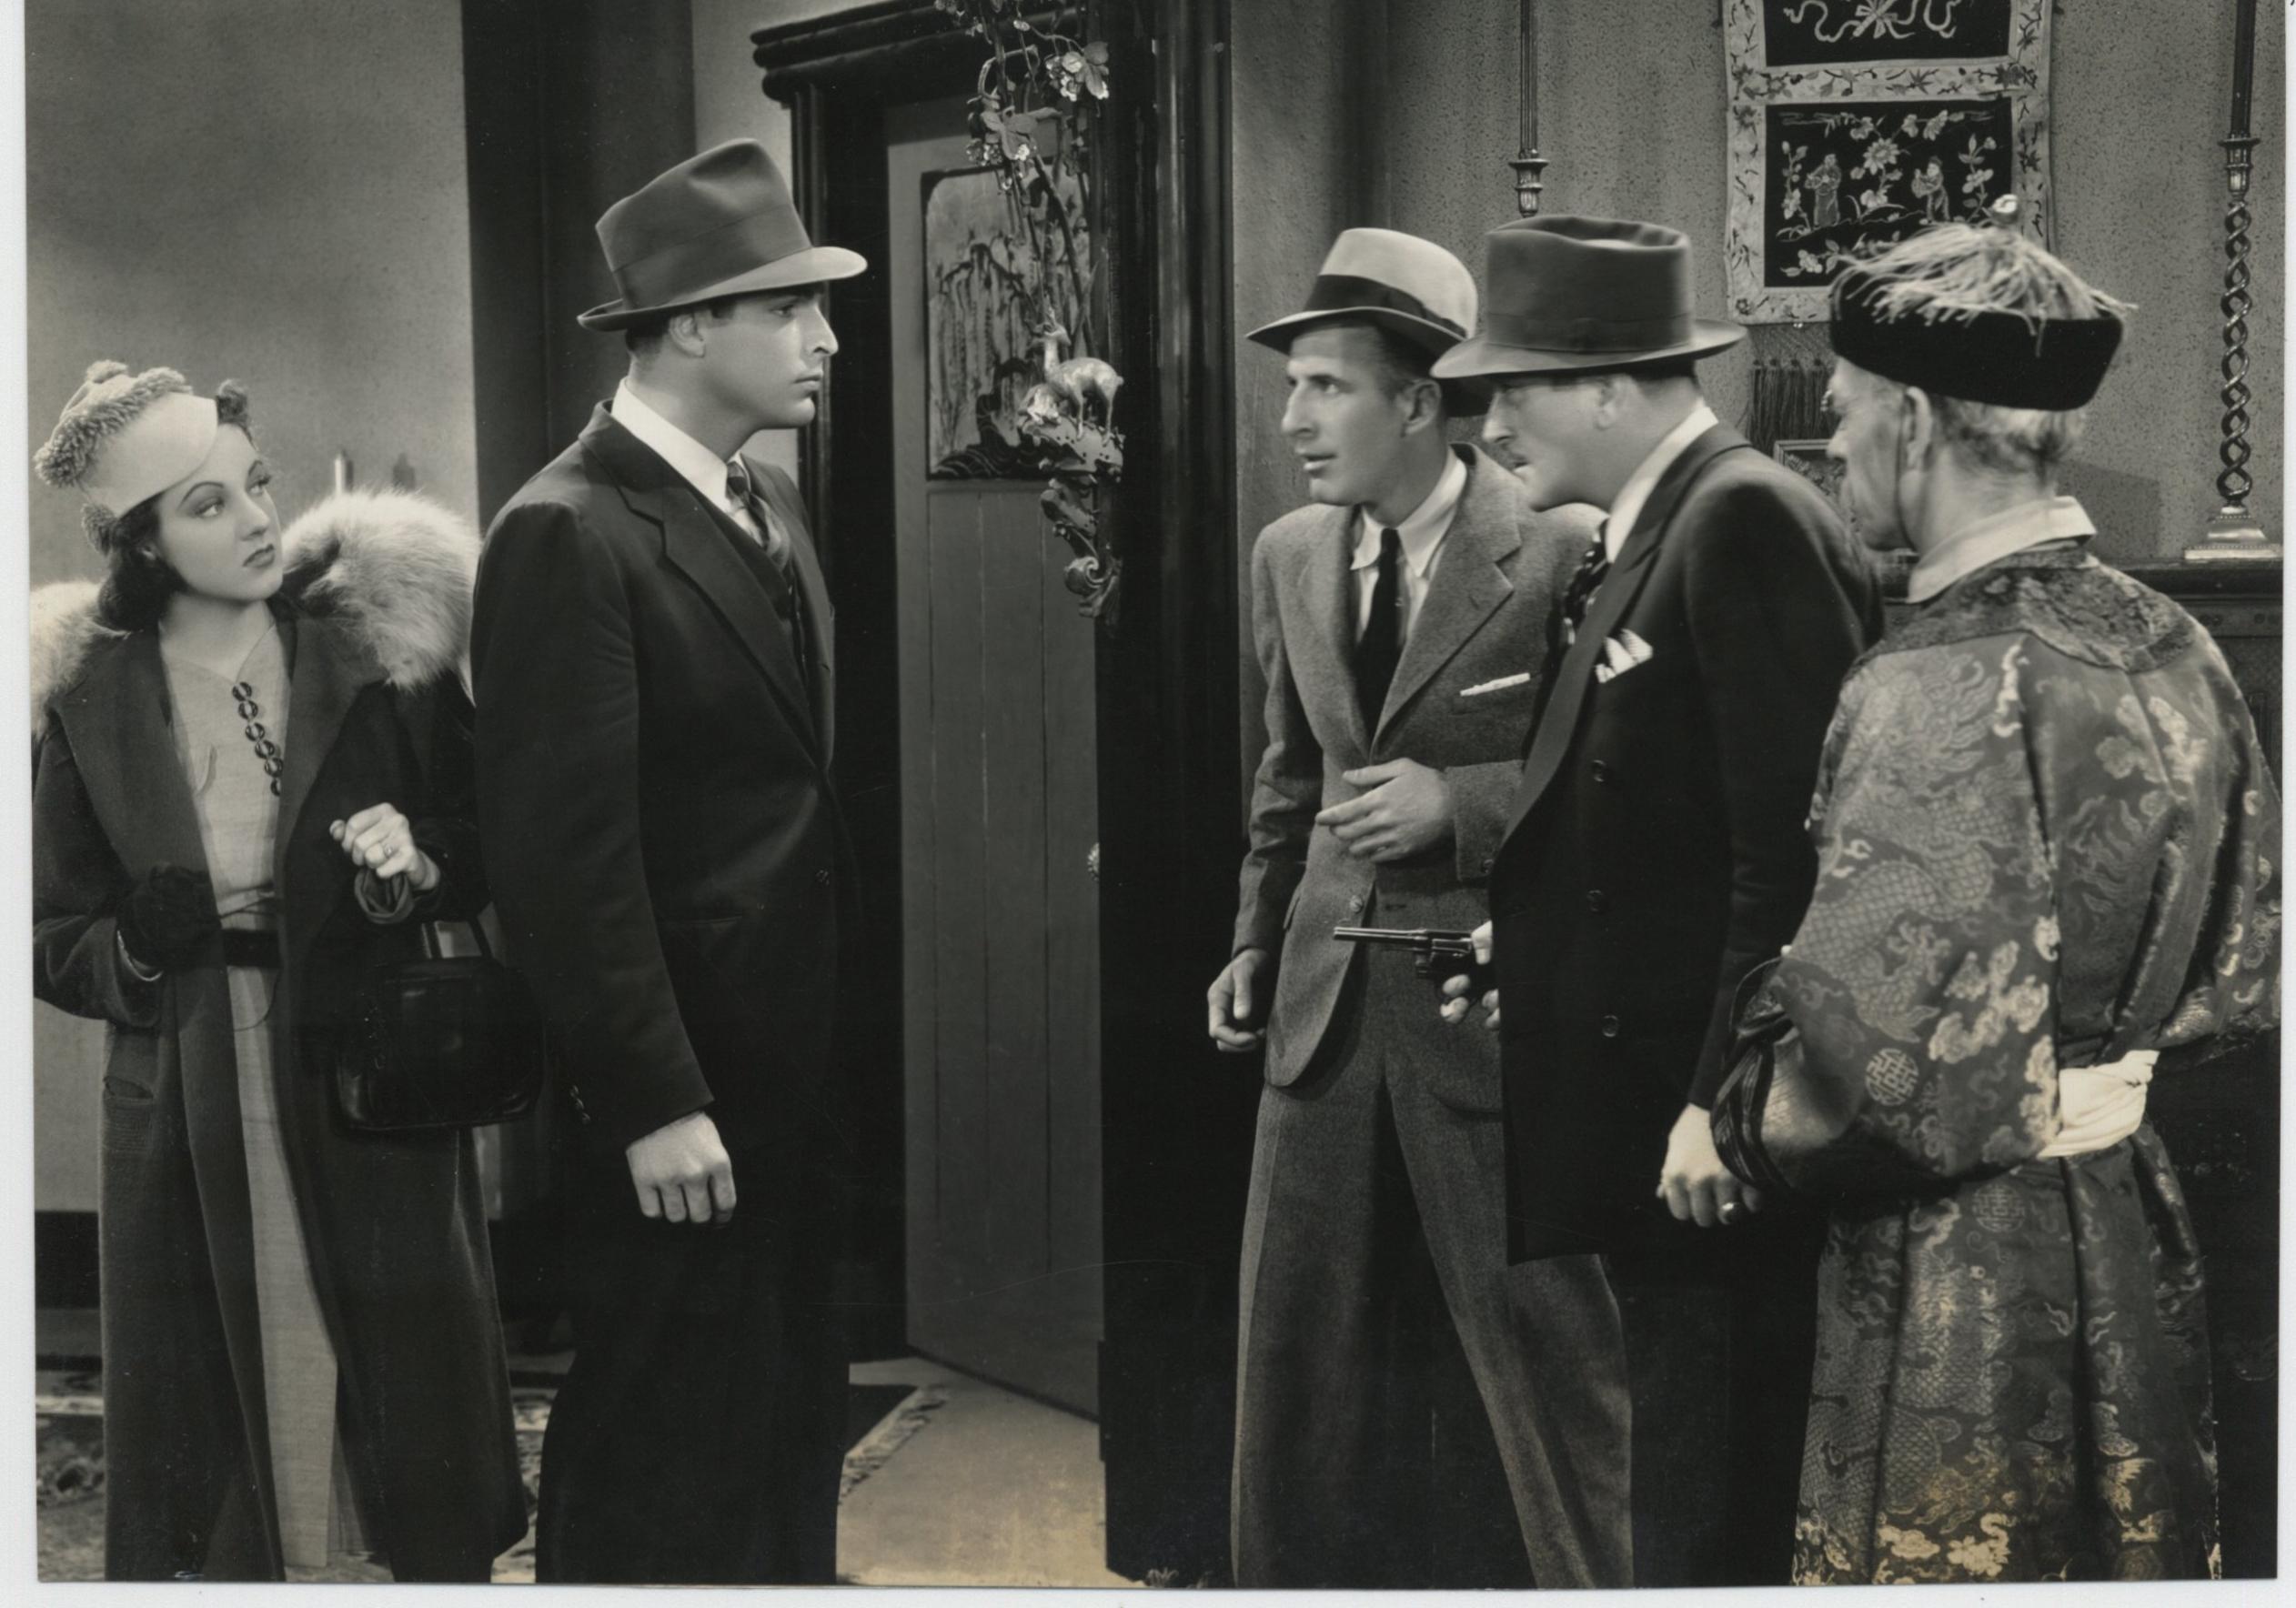 Buster Crabbe, Frank Lackteen, Wheeler Oakman, Edna Sedgewick, and James Sheridan in Red Barry (1938)